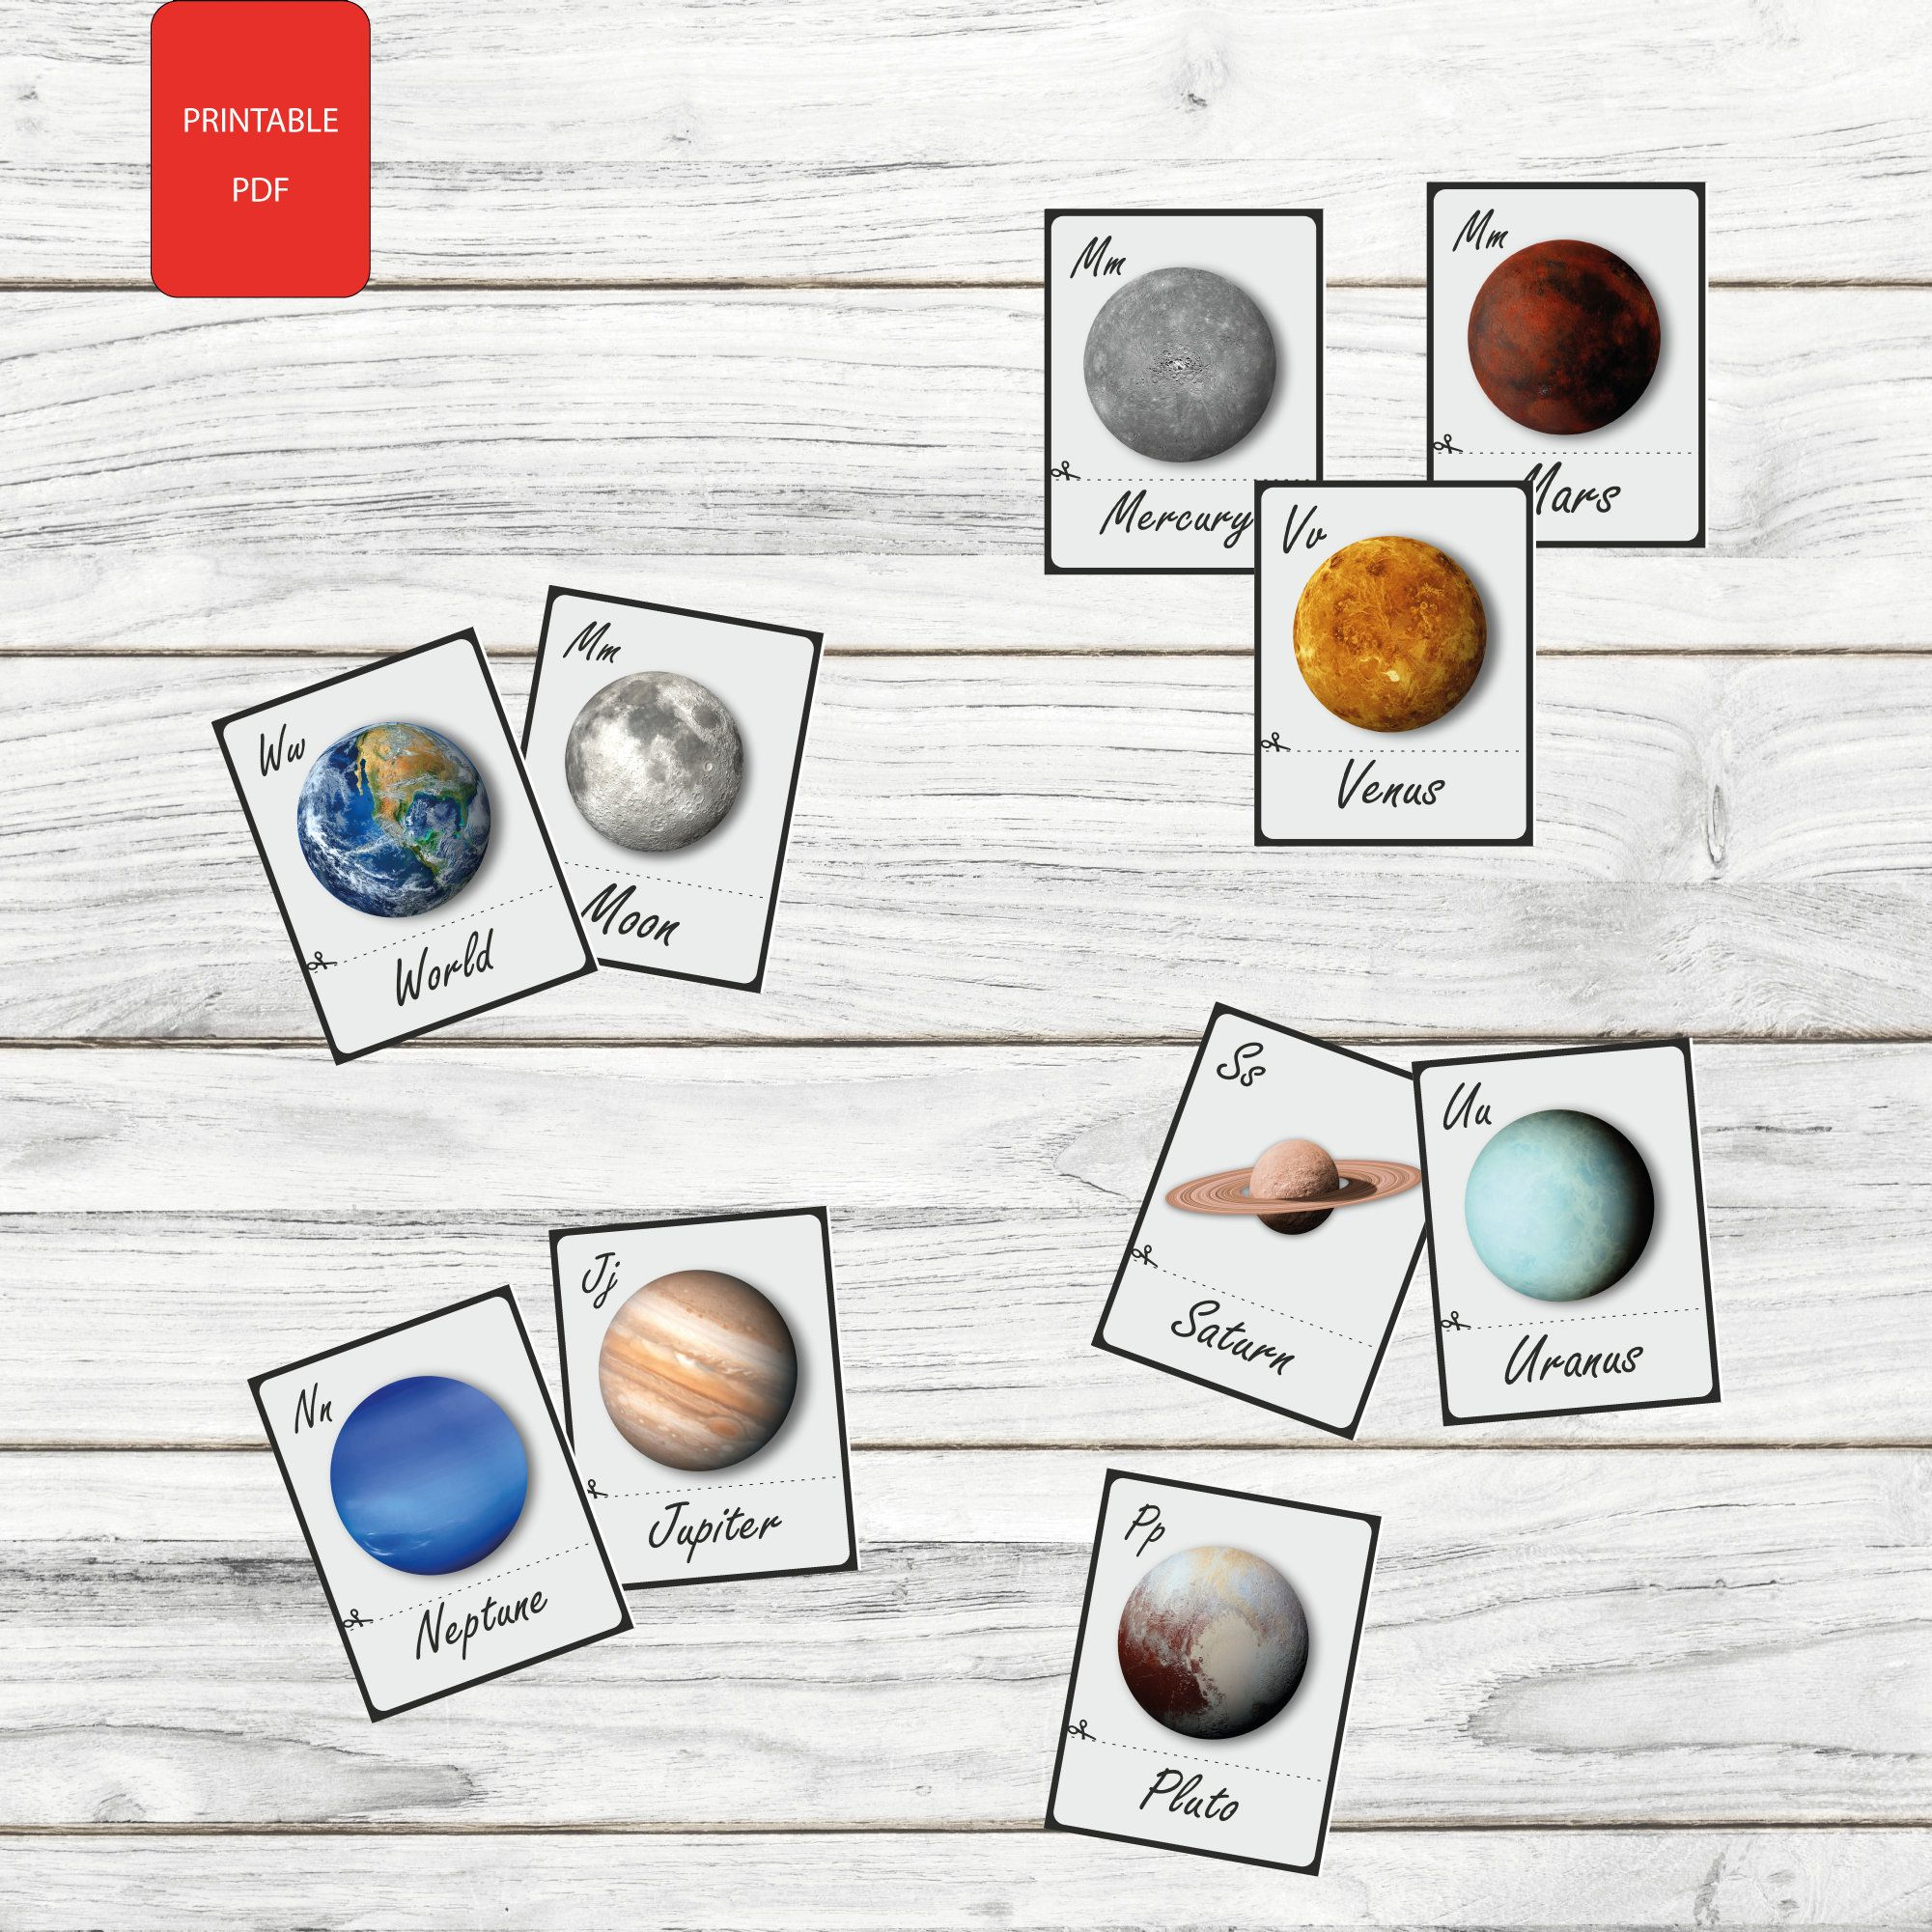 10 Printable Cuttable Solar System Planet Cards Flash Cards Naming Cards Pdf Printable Cards Preschool Toys By Art In 2021 Flashcards Solar System Planets Solar System [ 2001 x 2001 Pixel ]